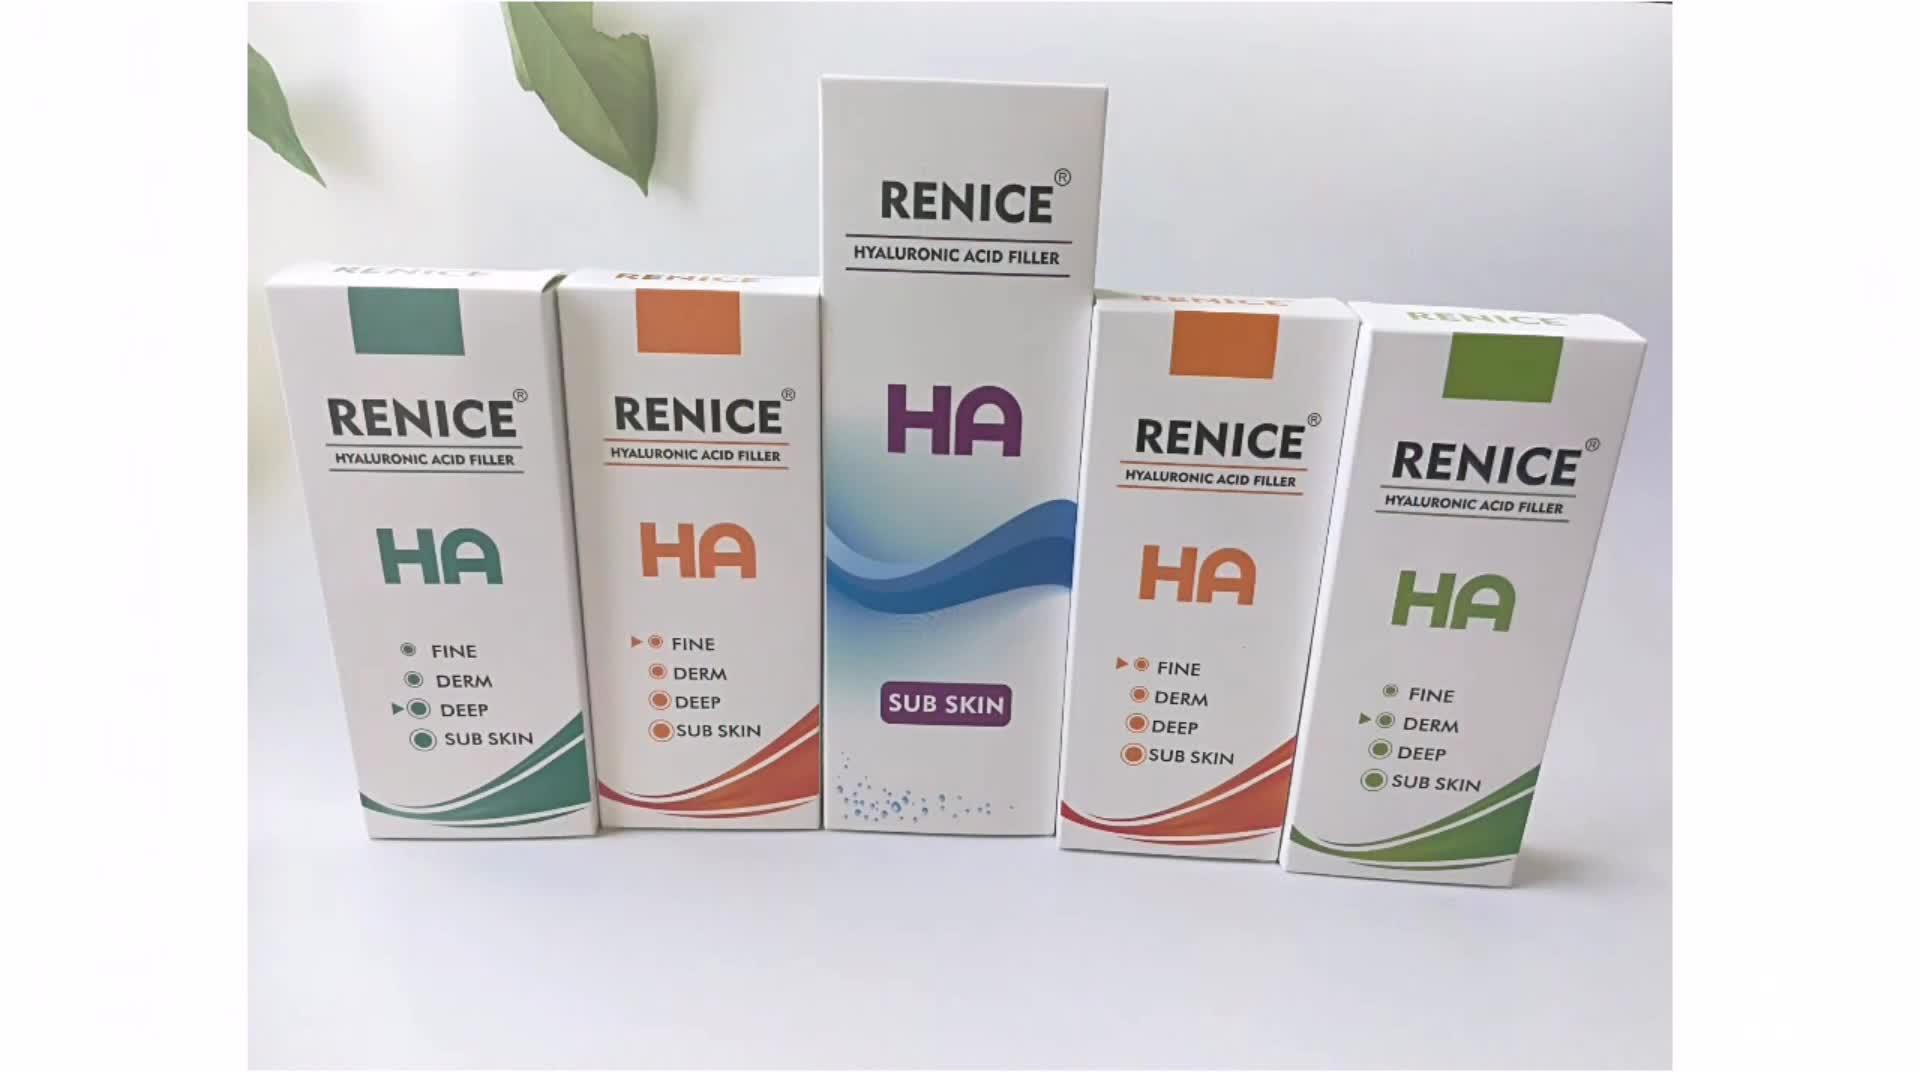 Cross-linked hyaluronic acid gel injection dermal filler